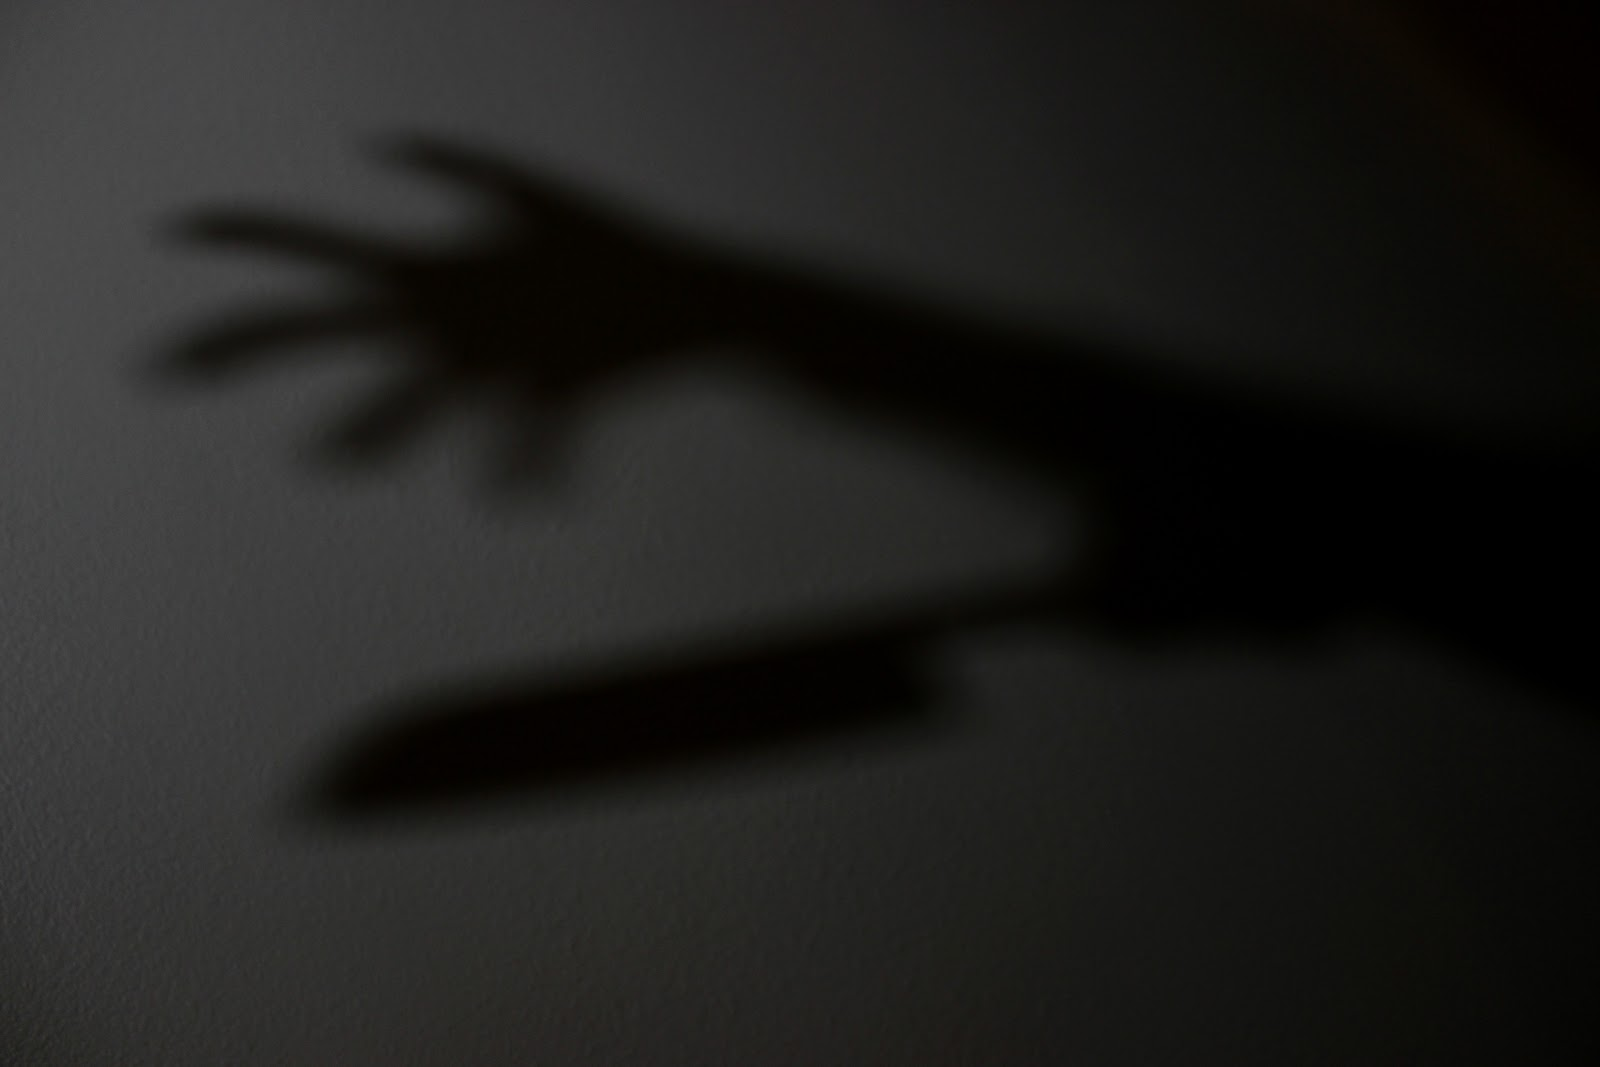 Creepy shadows | MadilynPaige Photography: madilynpaigephotography.blogspot.com/2013/03/creepy-shadows.html#!